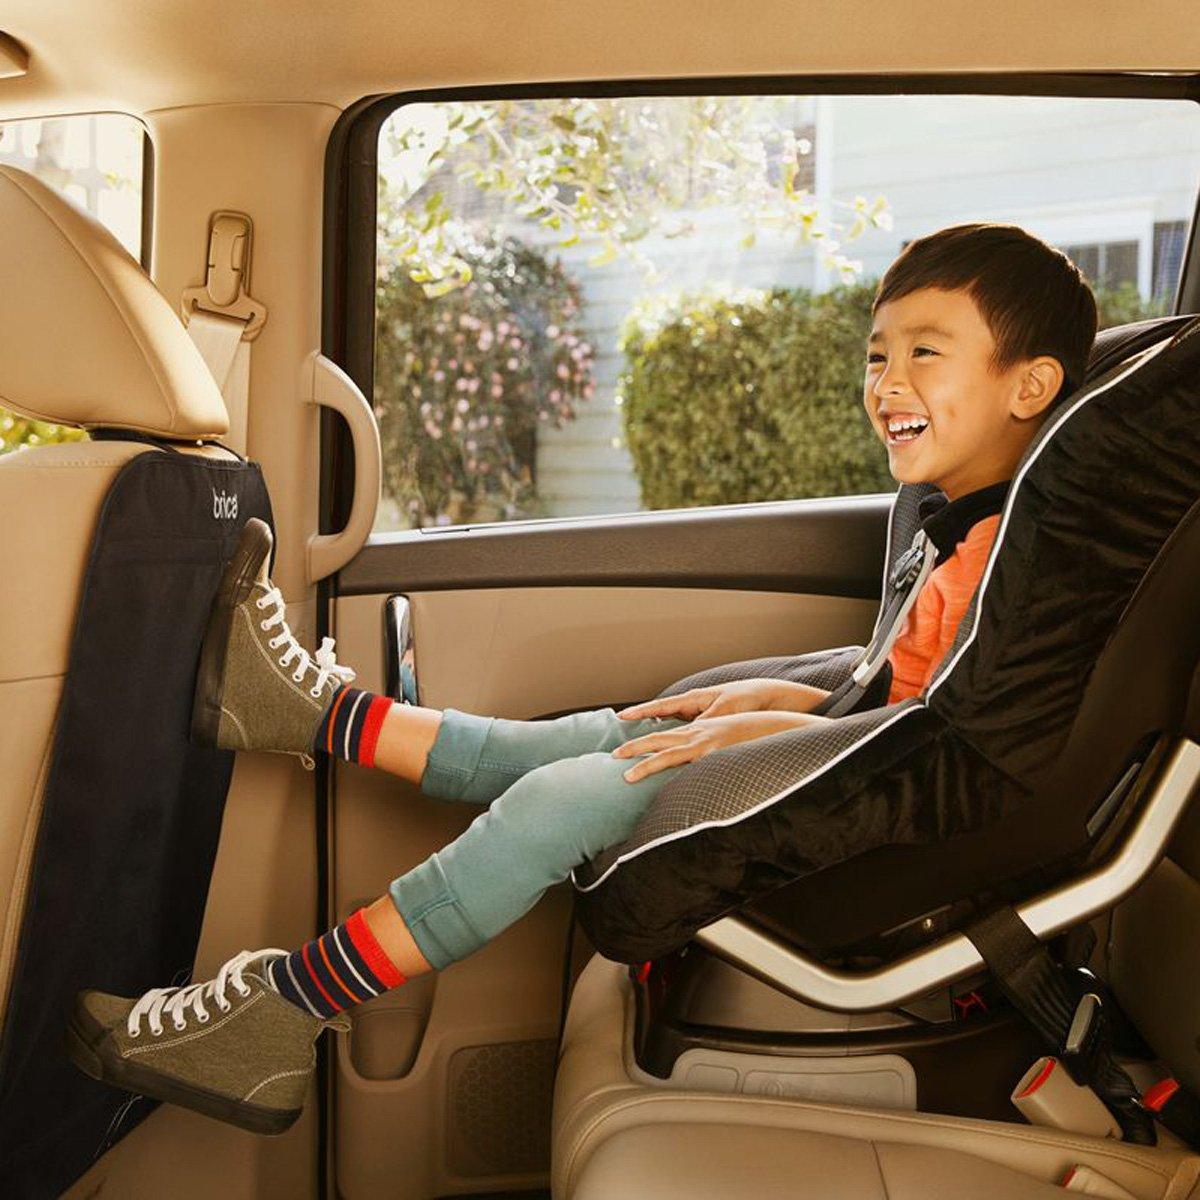 BRICA Deluxe Car Seat Kick Mats Pack of 2